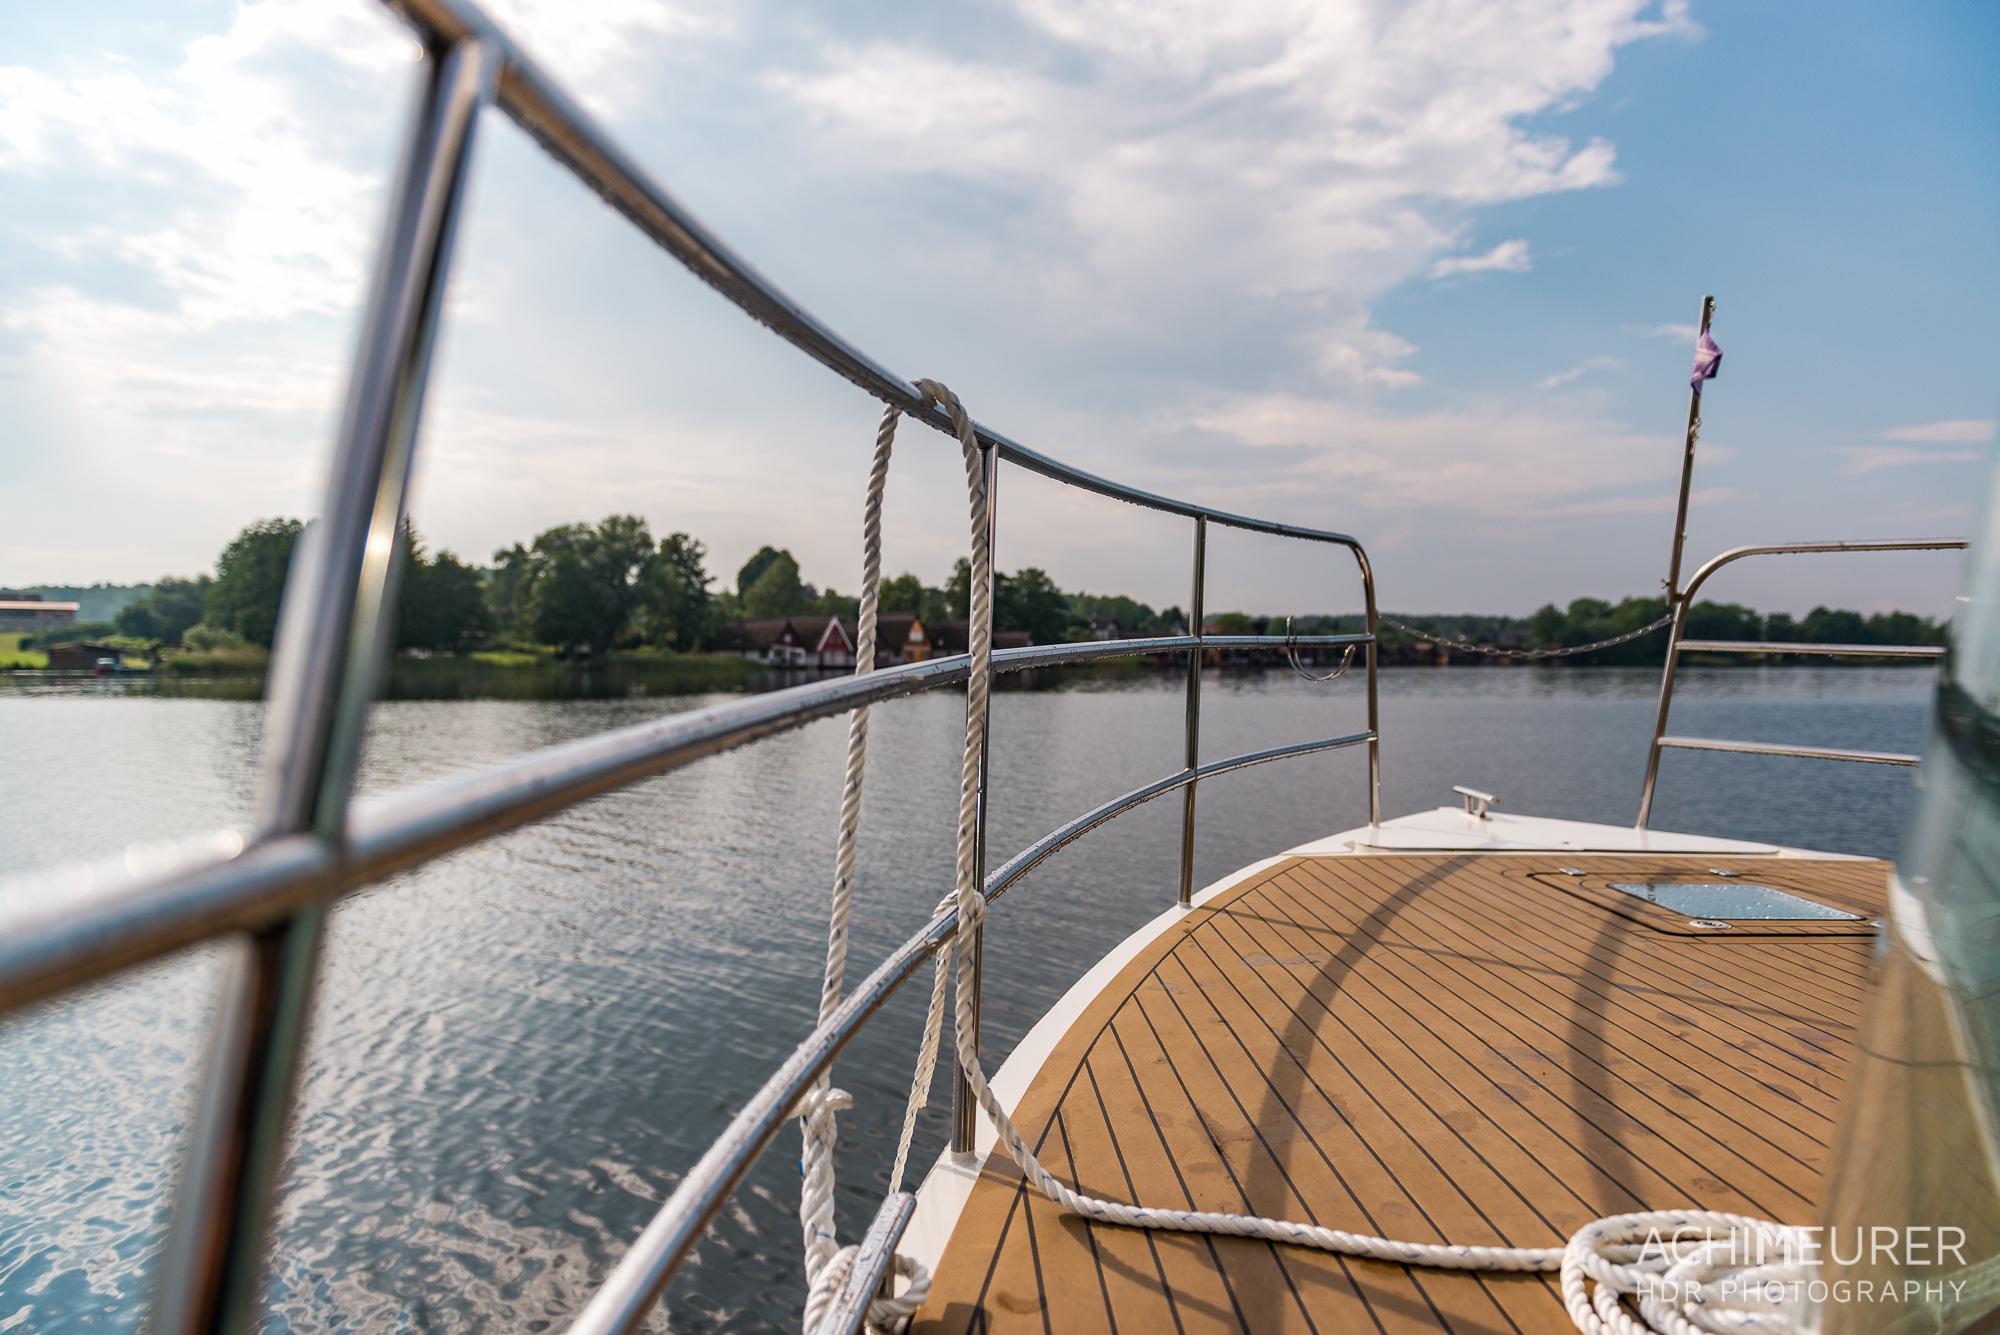 Hausboot-Kuhnle-Mueritz-Mecklenburg-Vorpommern-See_2620